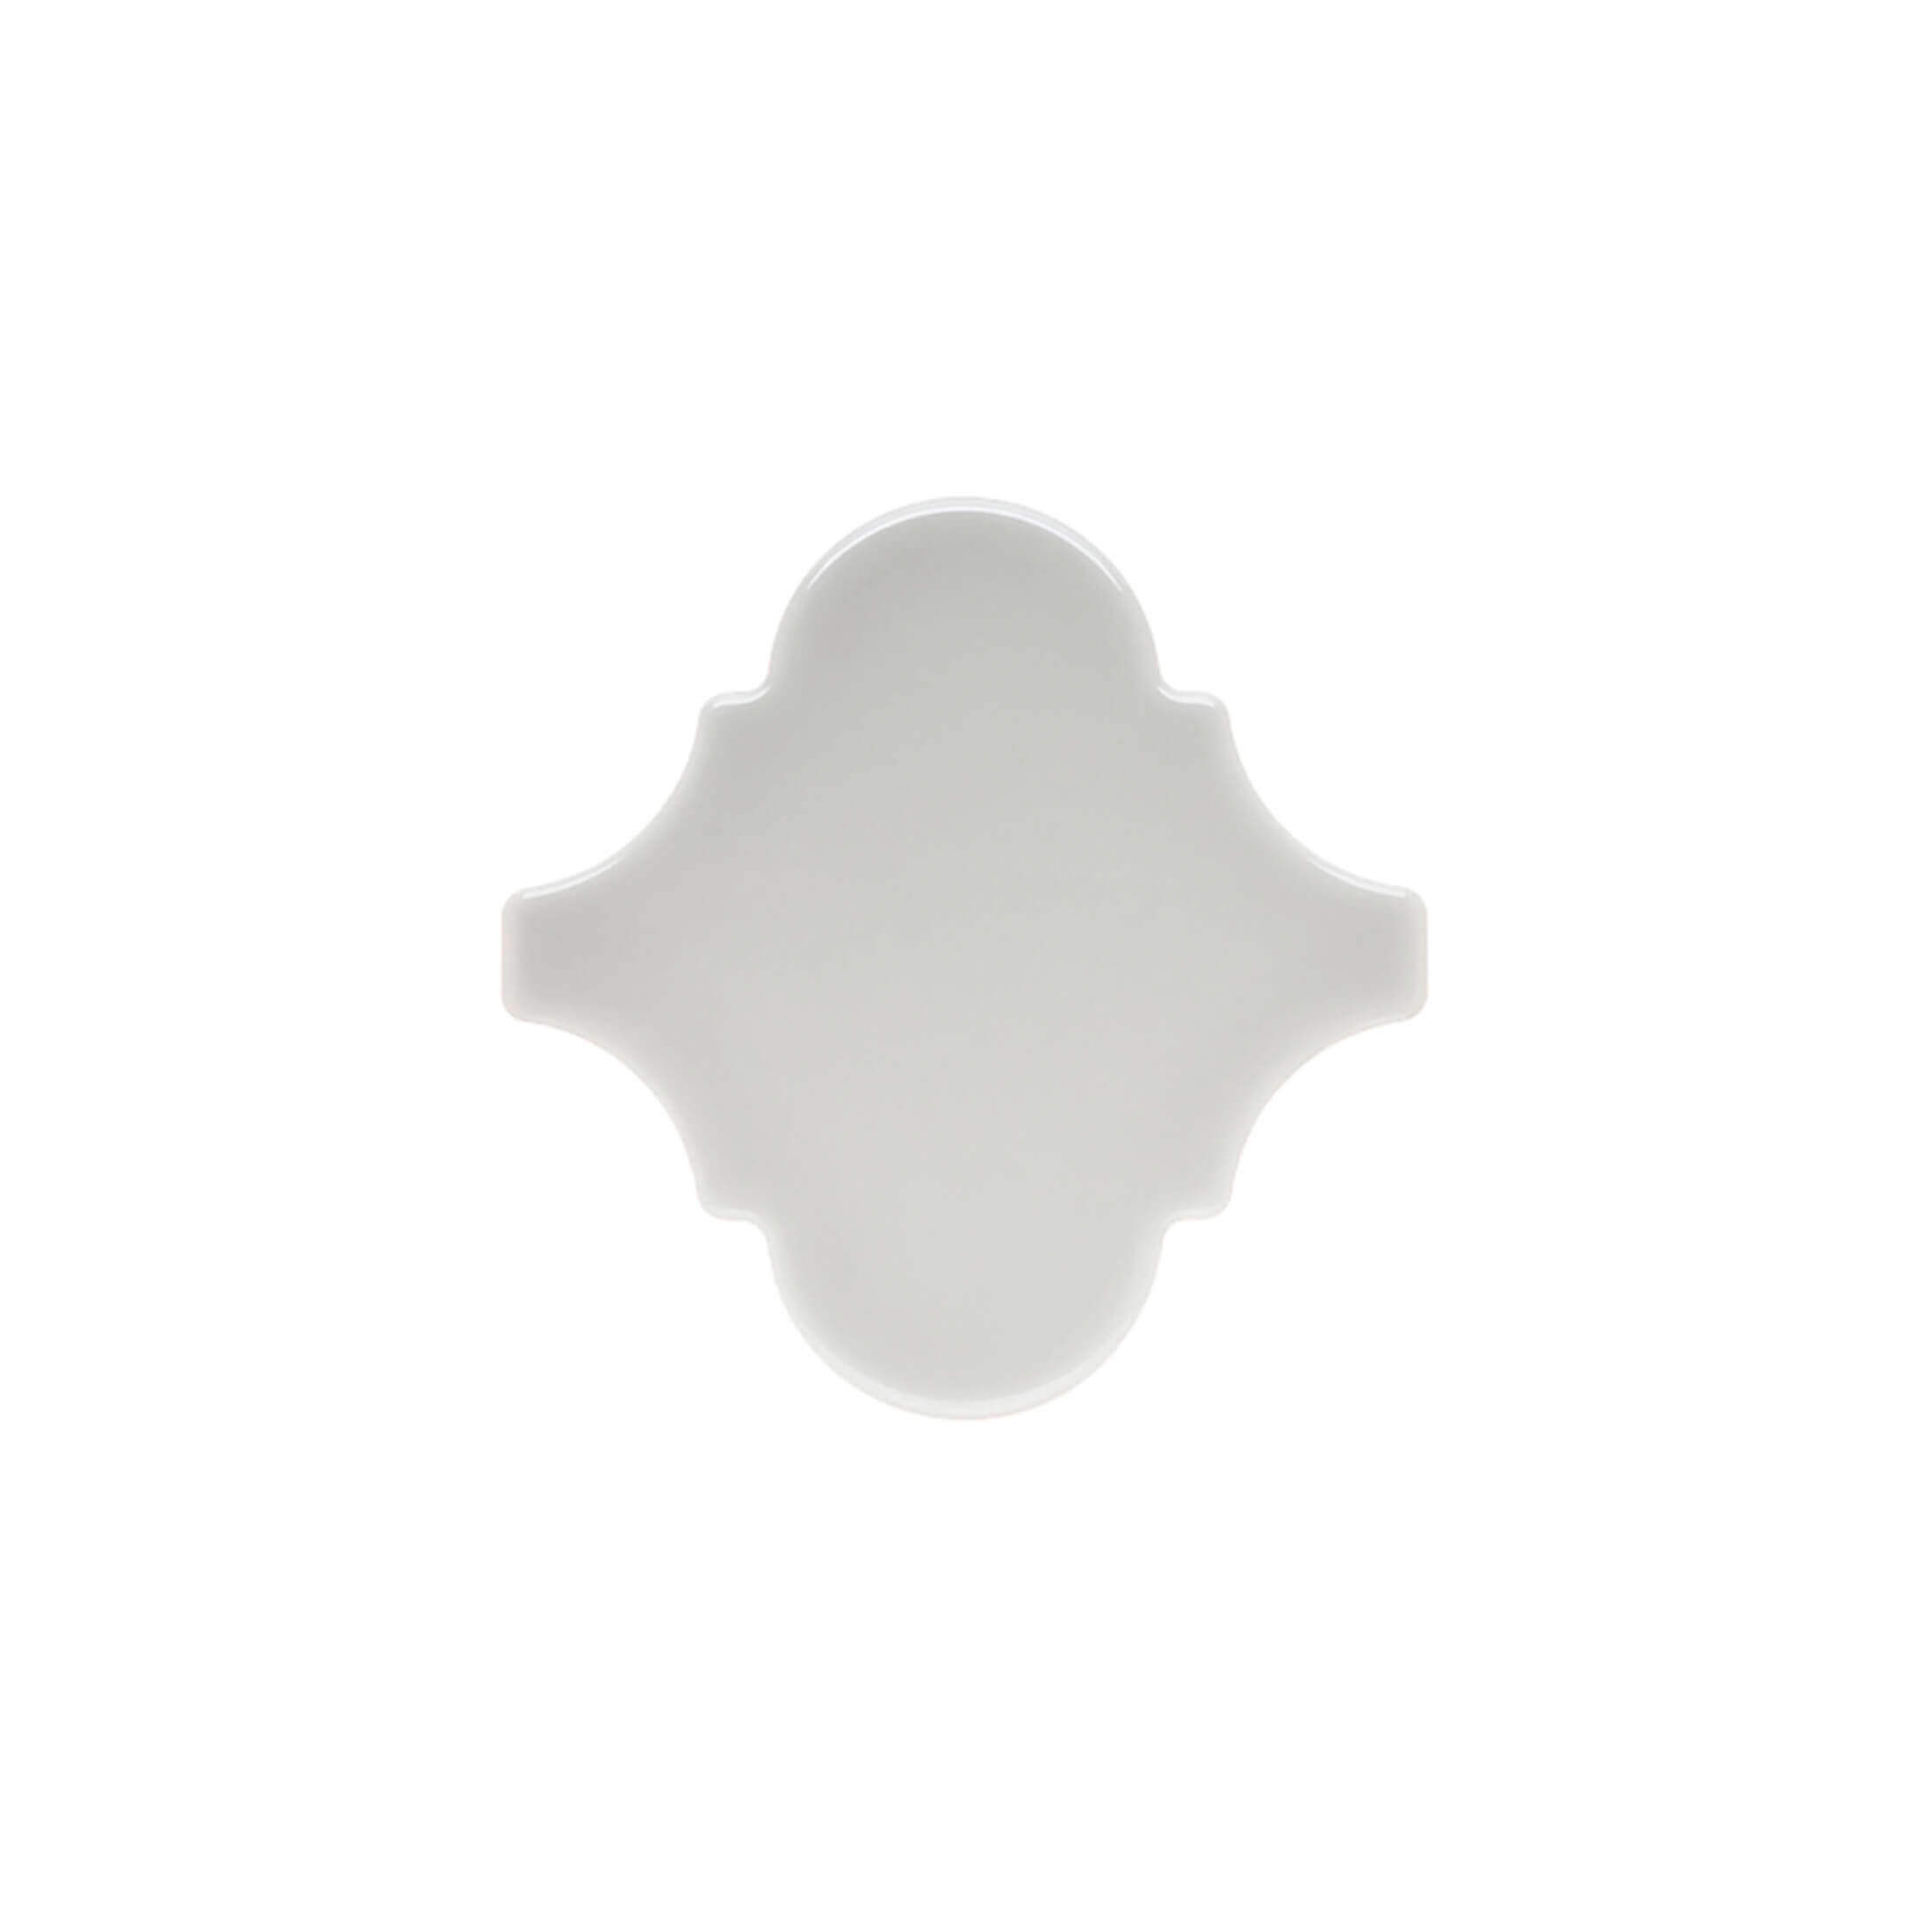 ADNE8113 - ARABESCO SILVER MIST - 15 cm X 15 cm